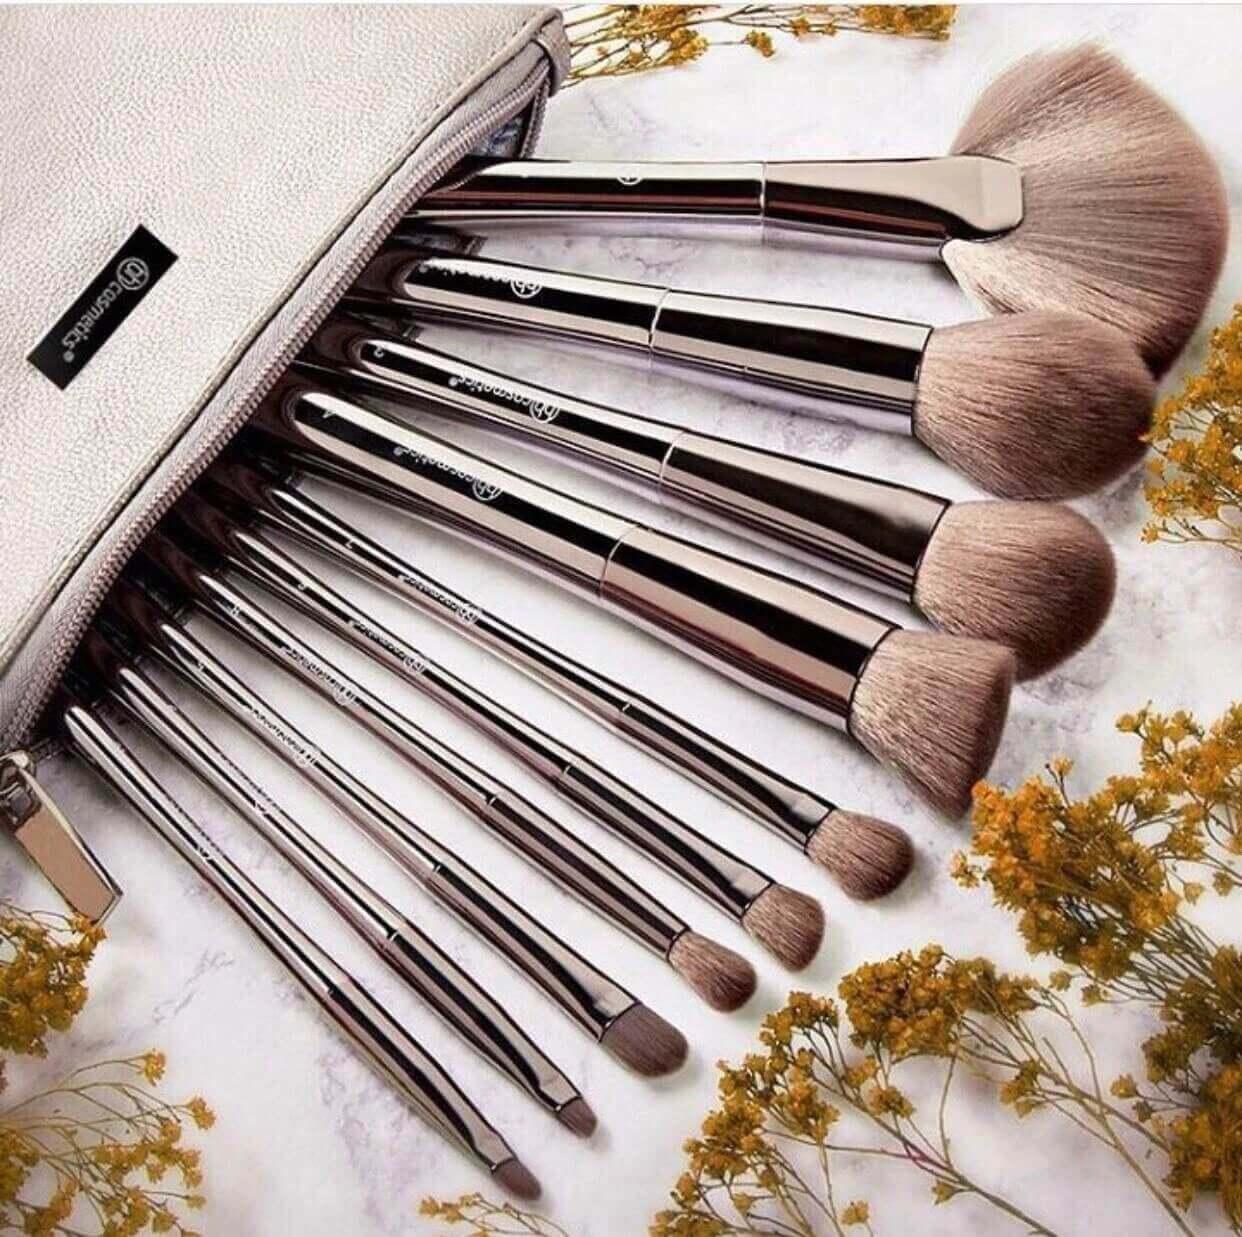 BH cosmetics 10 pcs brush set in pakistan sanwarna.pk